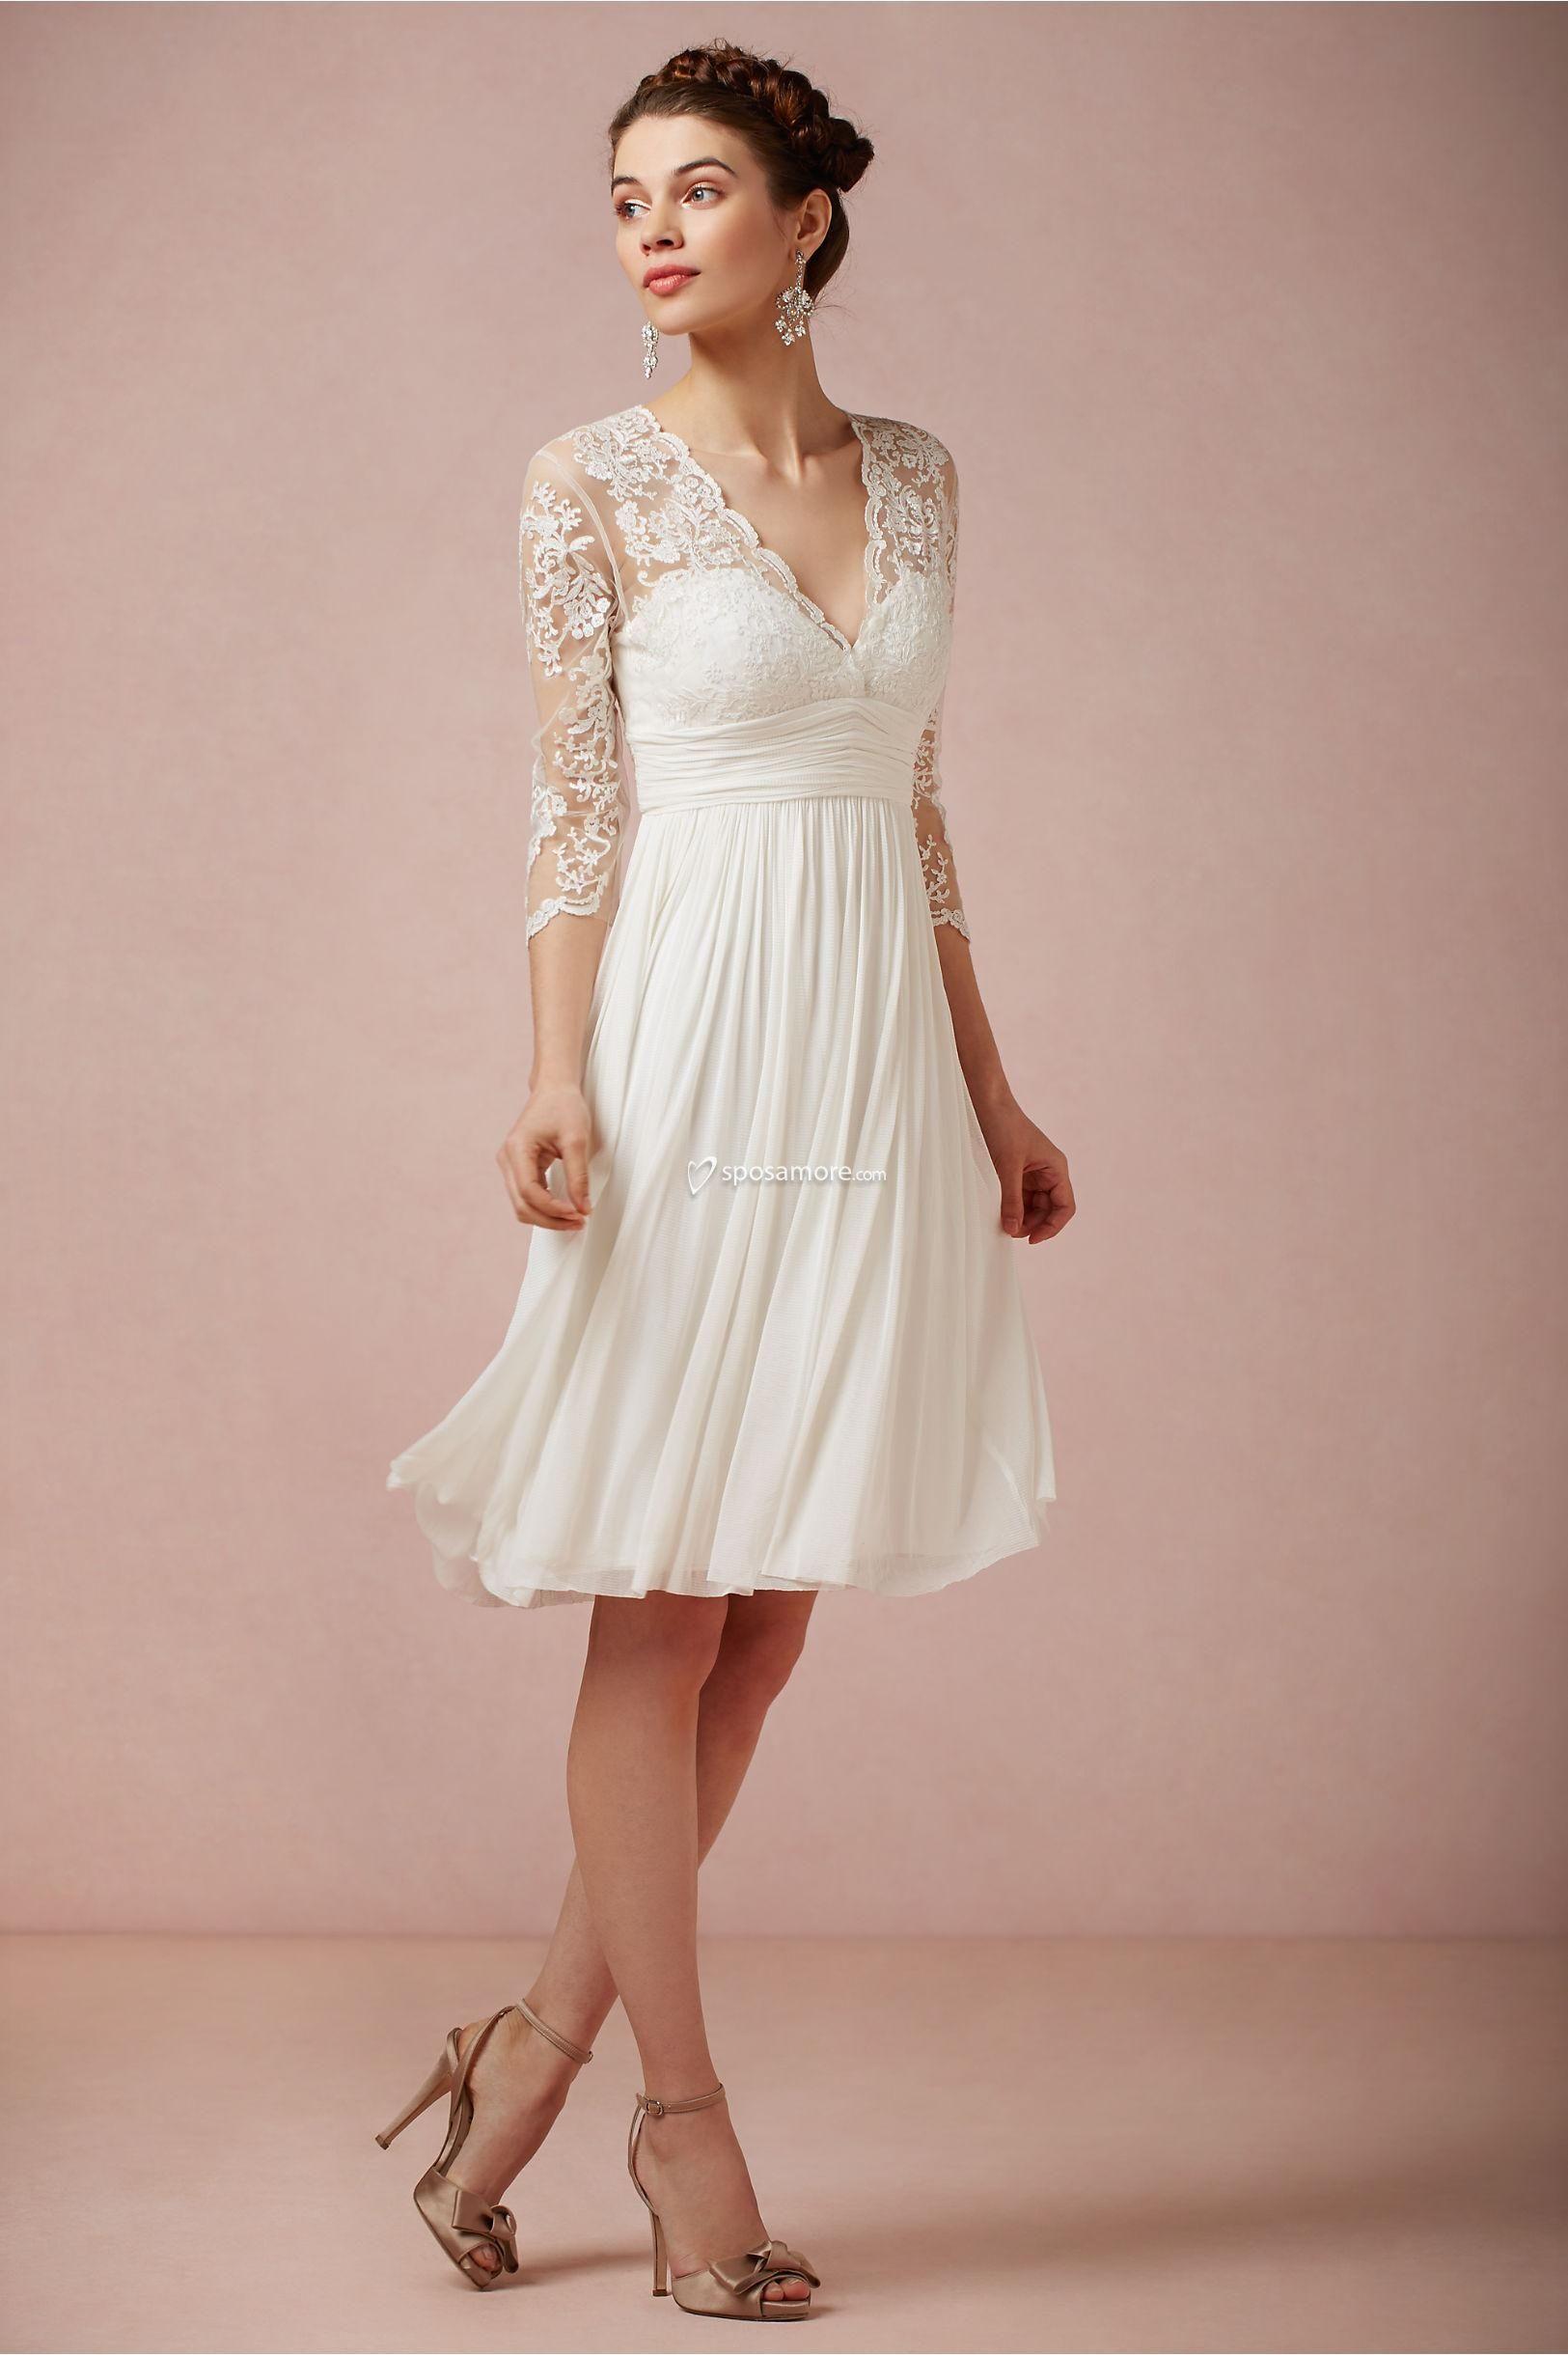 Fantástico Vestidos Novia Baratos Ideas Ornamento Elaboración ...